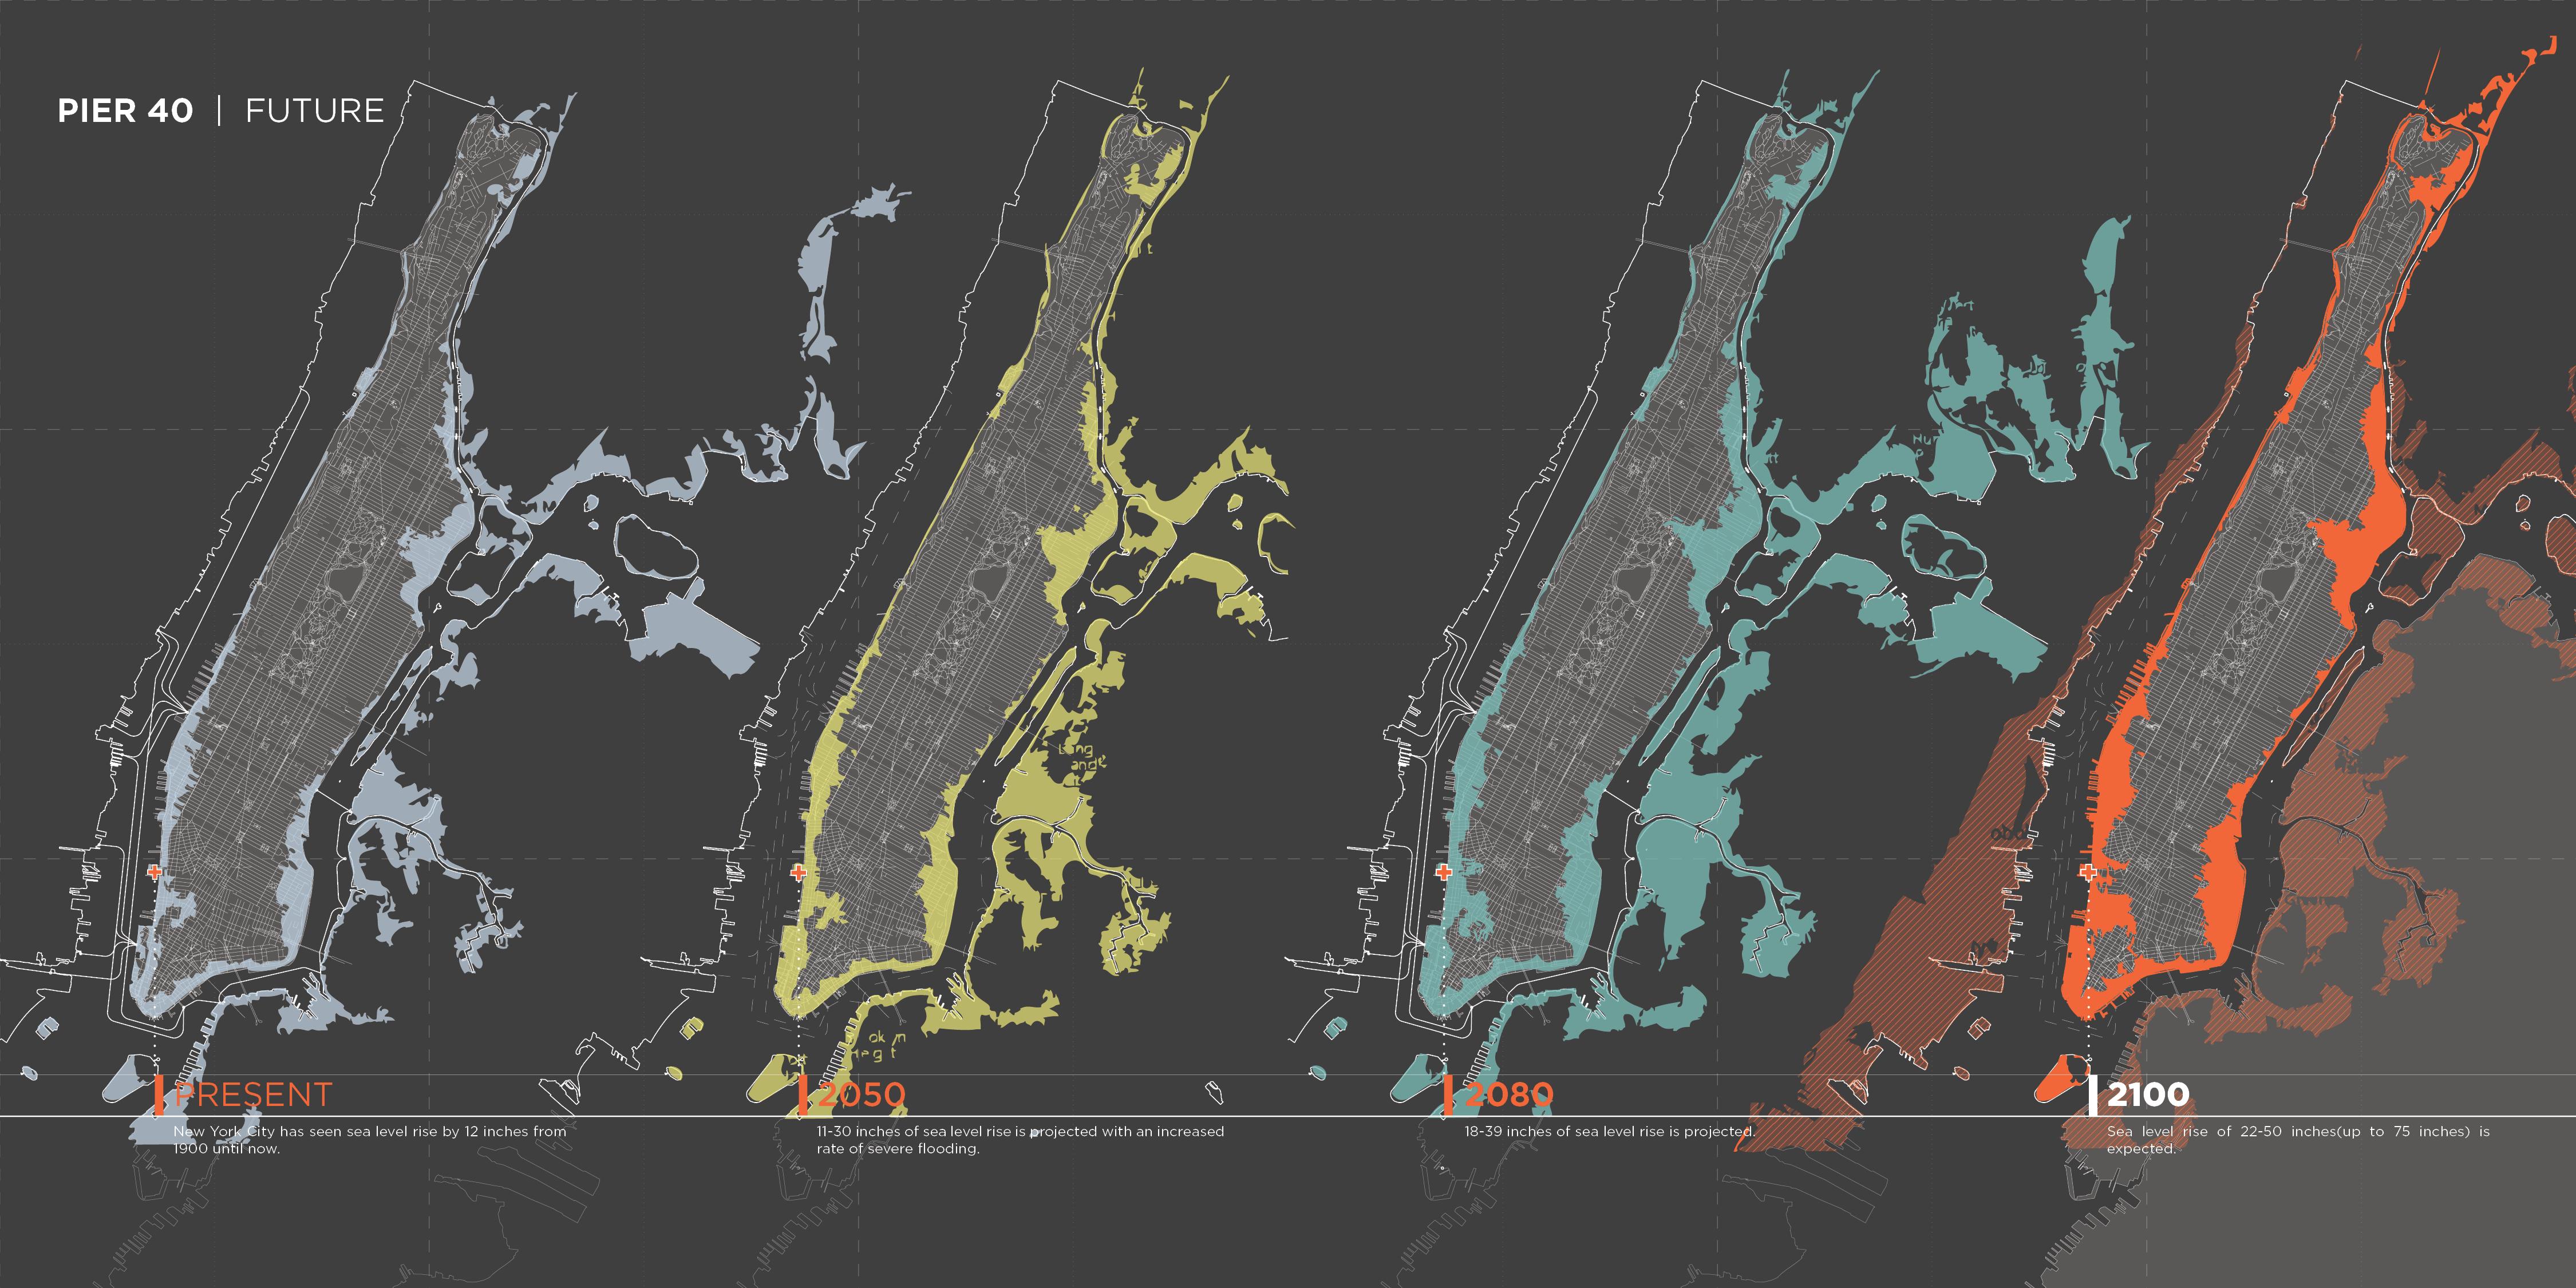 New York Subway Map 2100.Pier 40 2100 Dfa